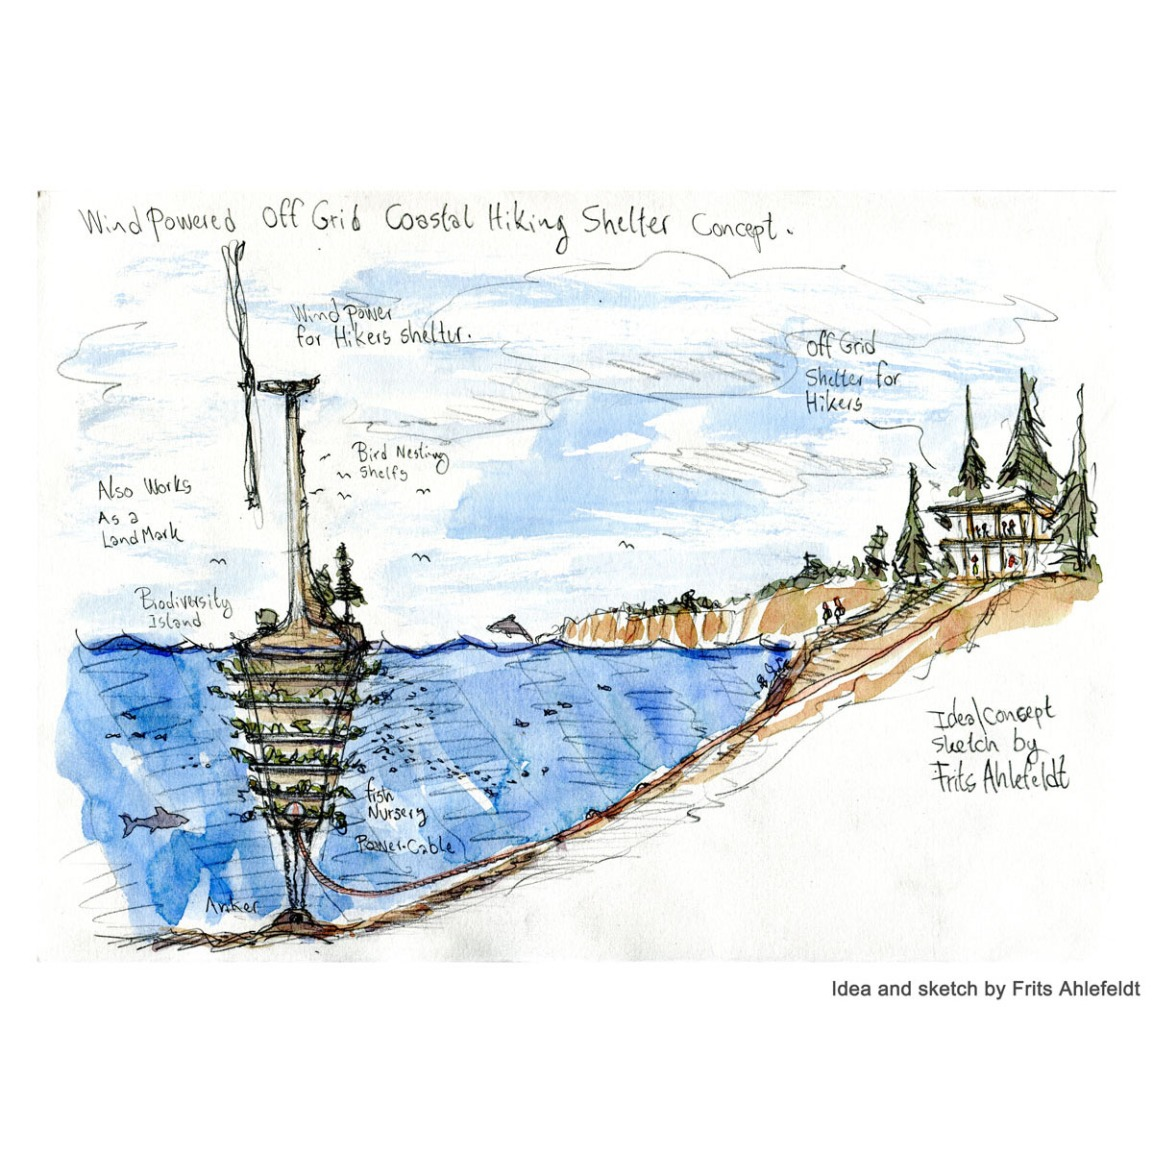 Seal island wind turbine biodiversityconcept